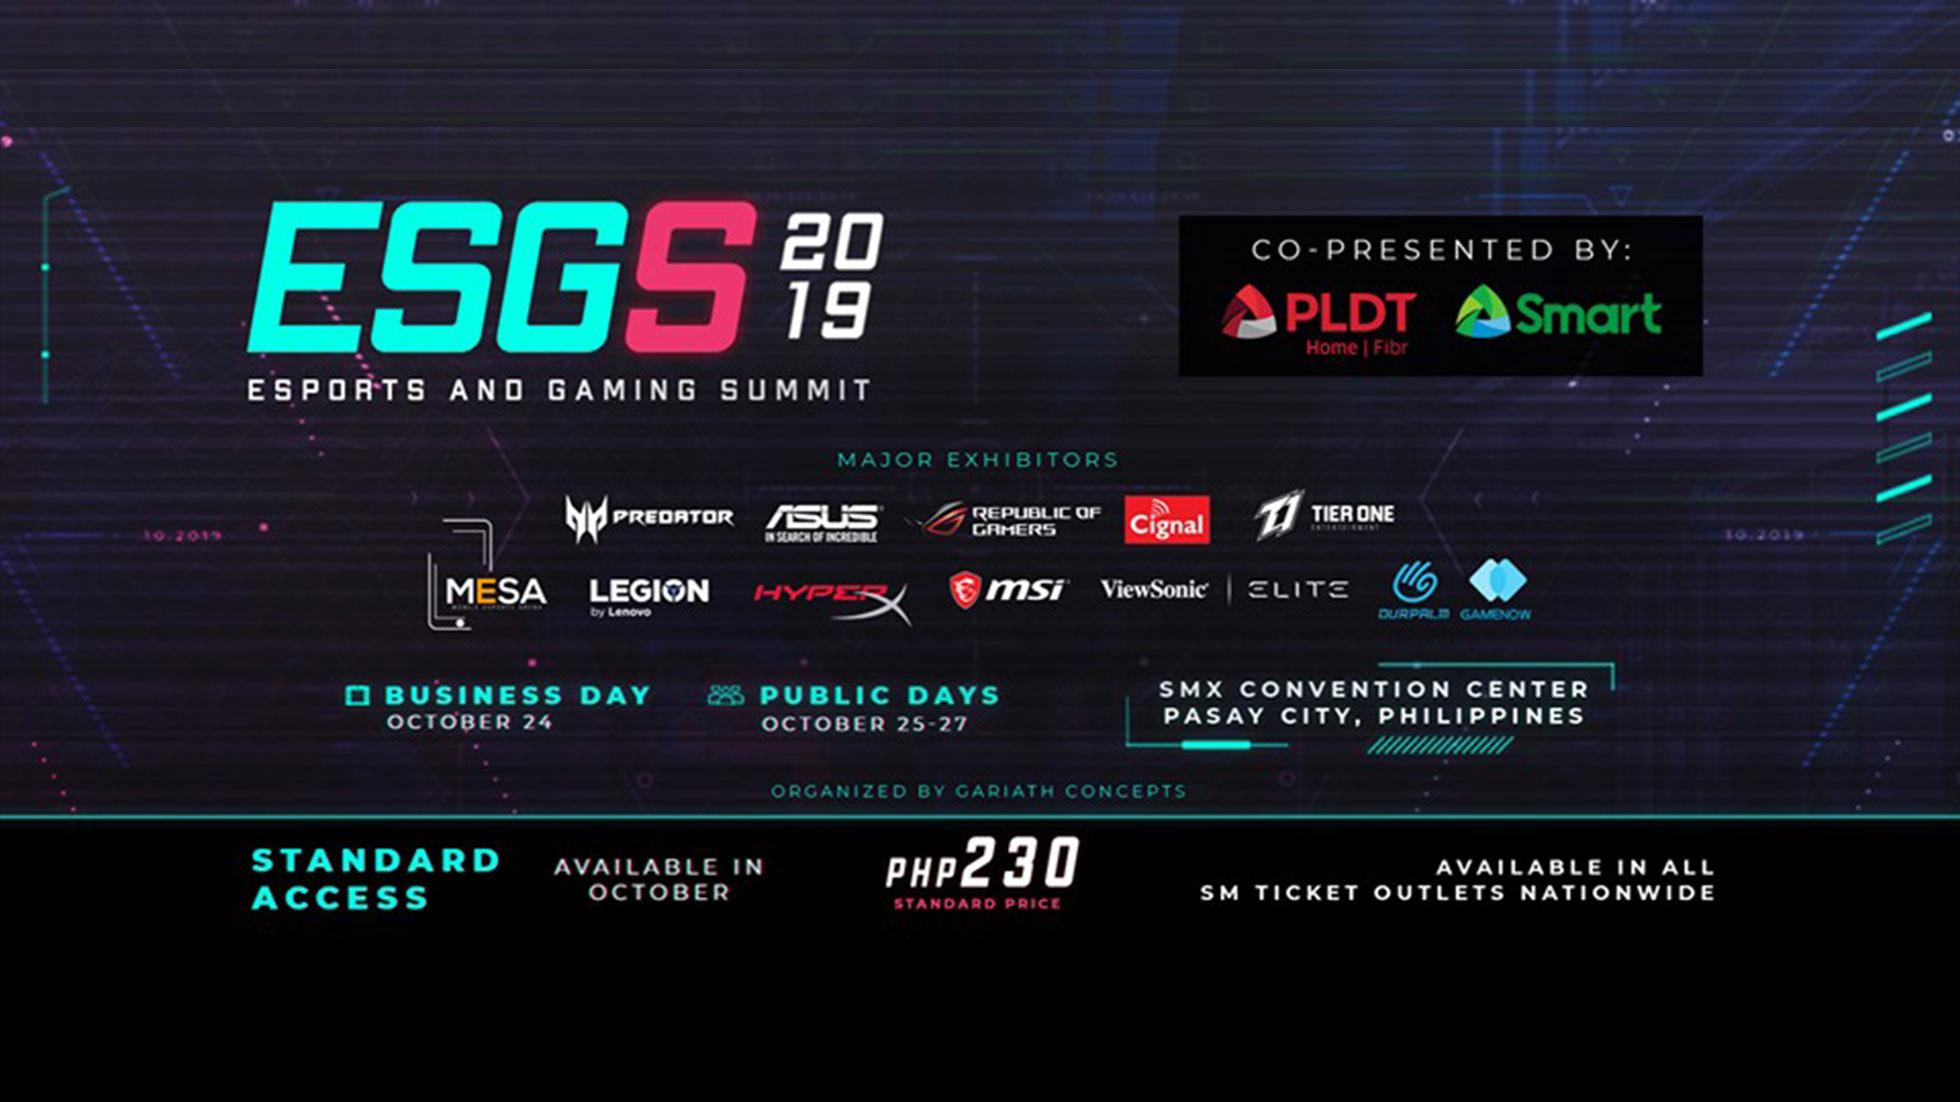 ESGS 2019